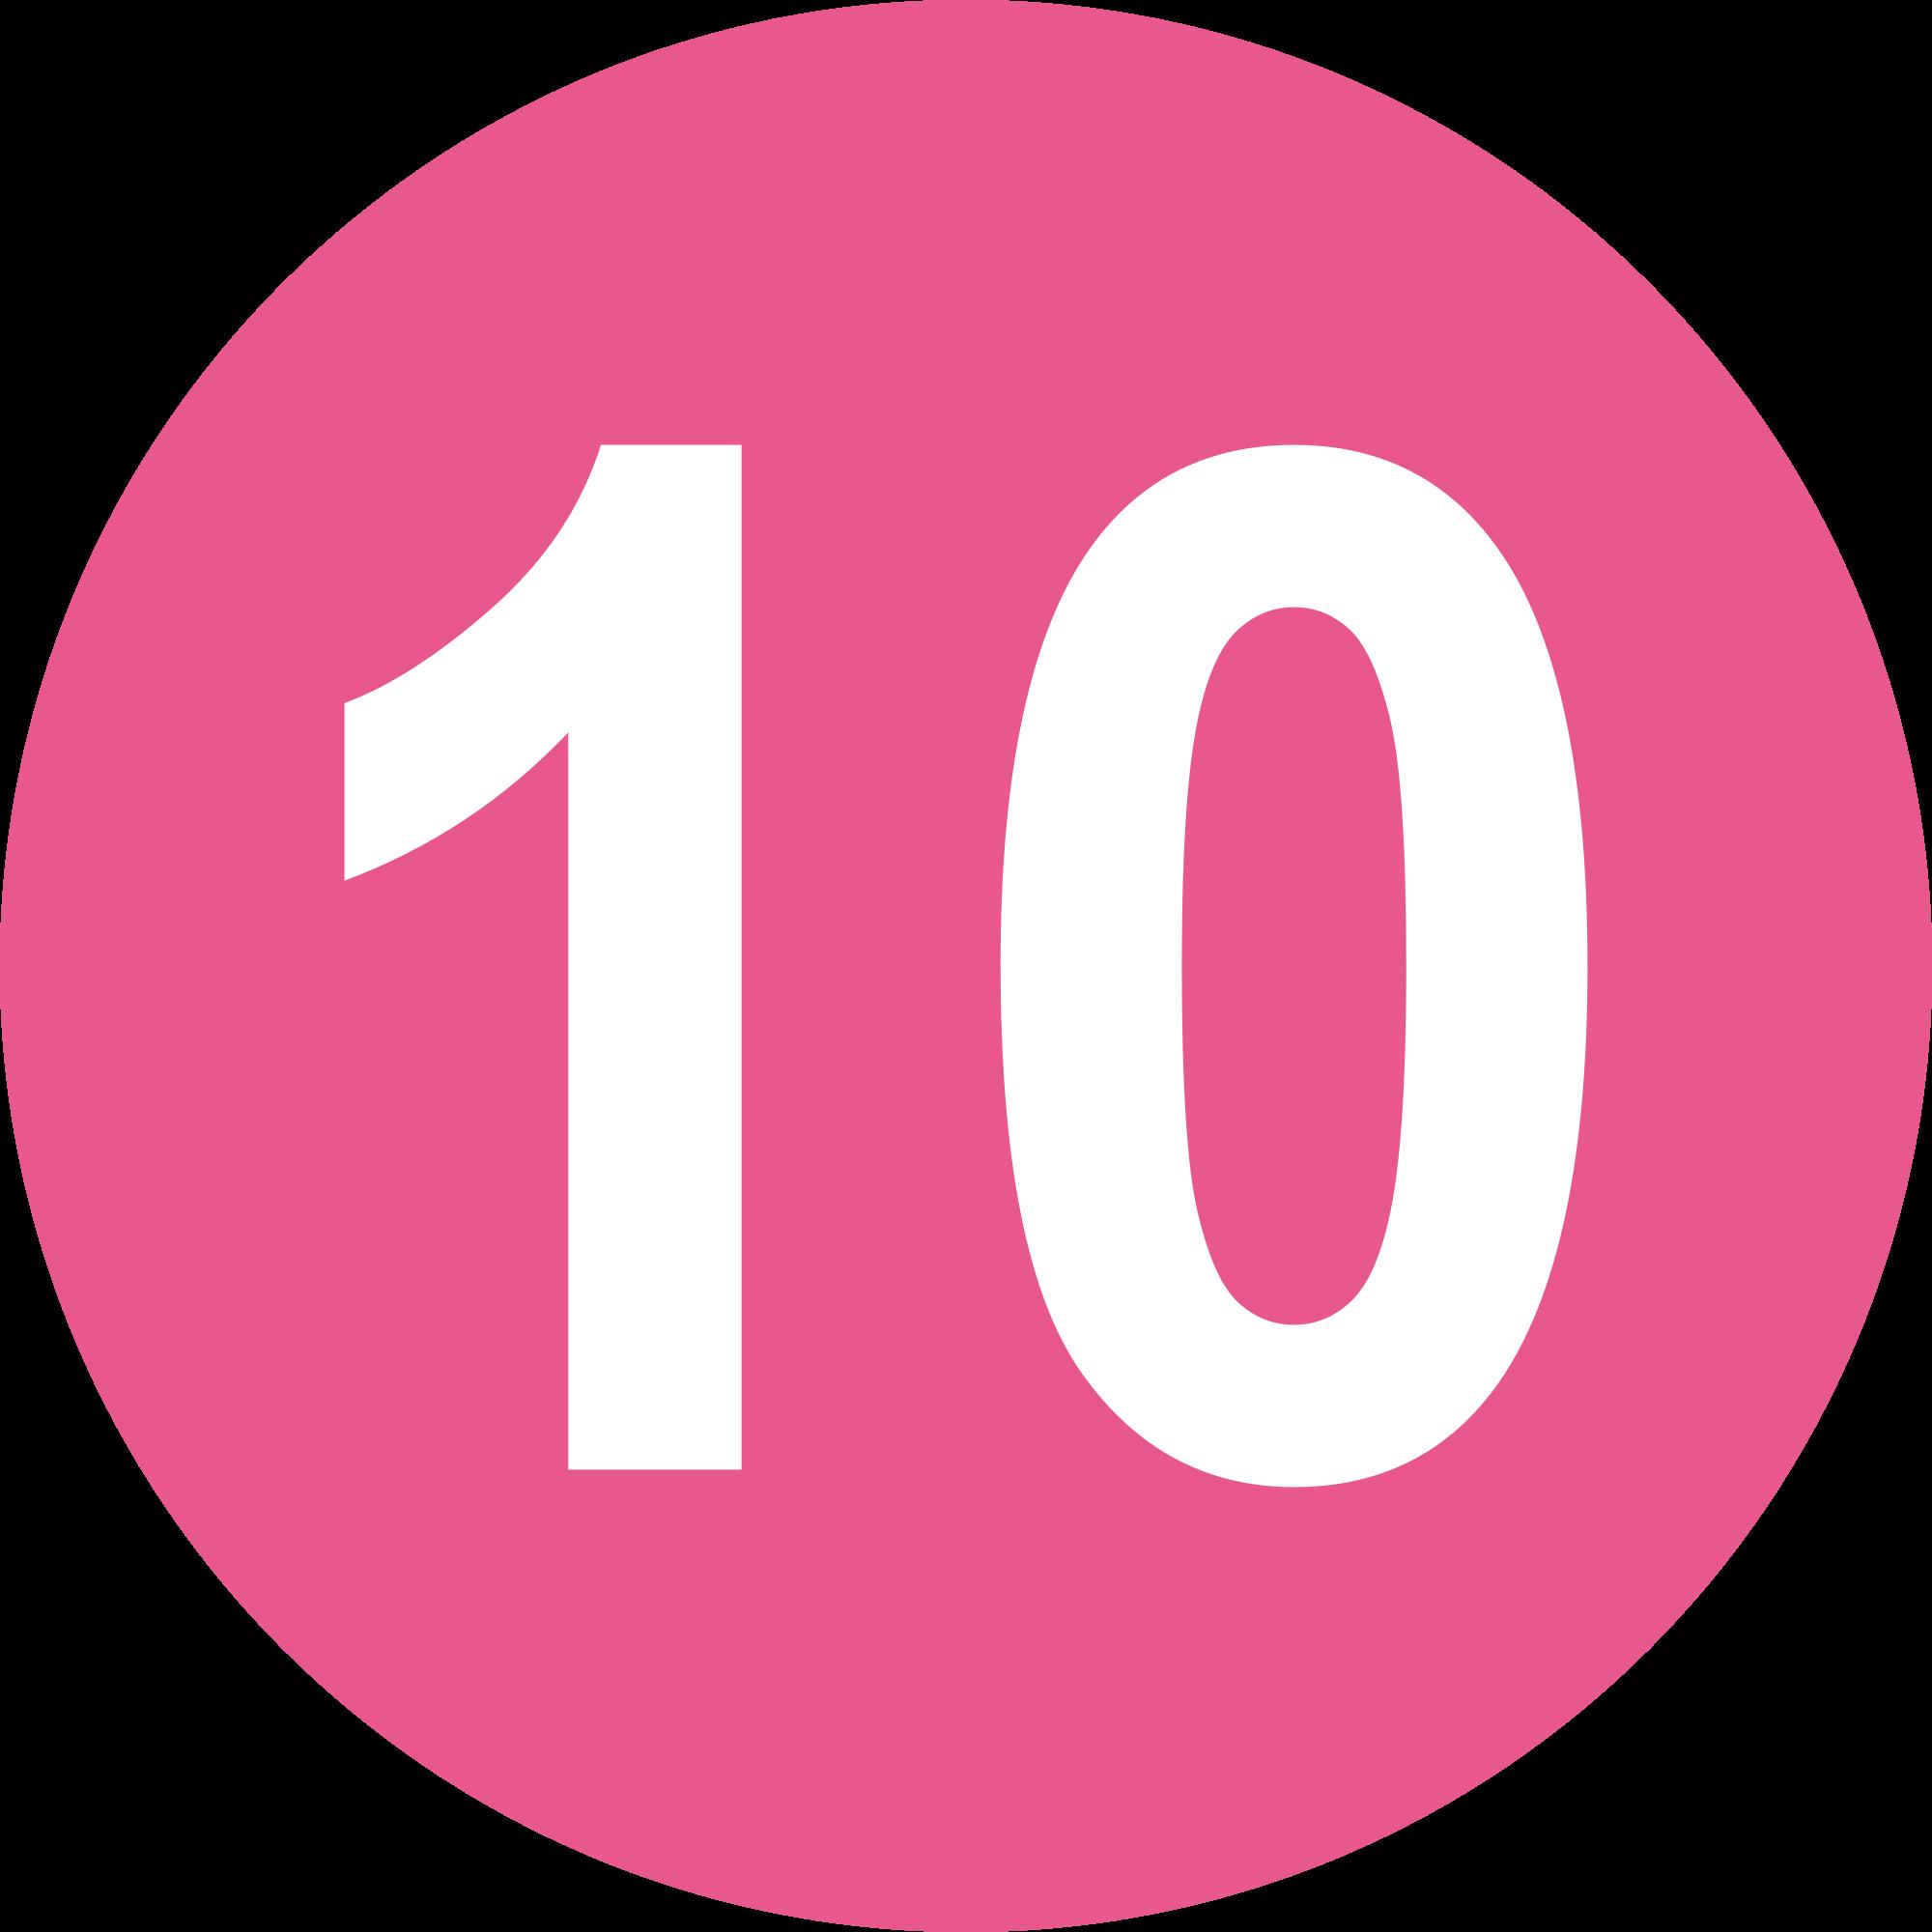 10 Number PNG Image.